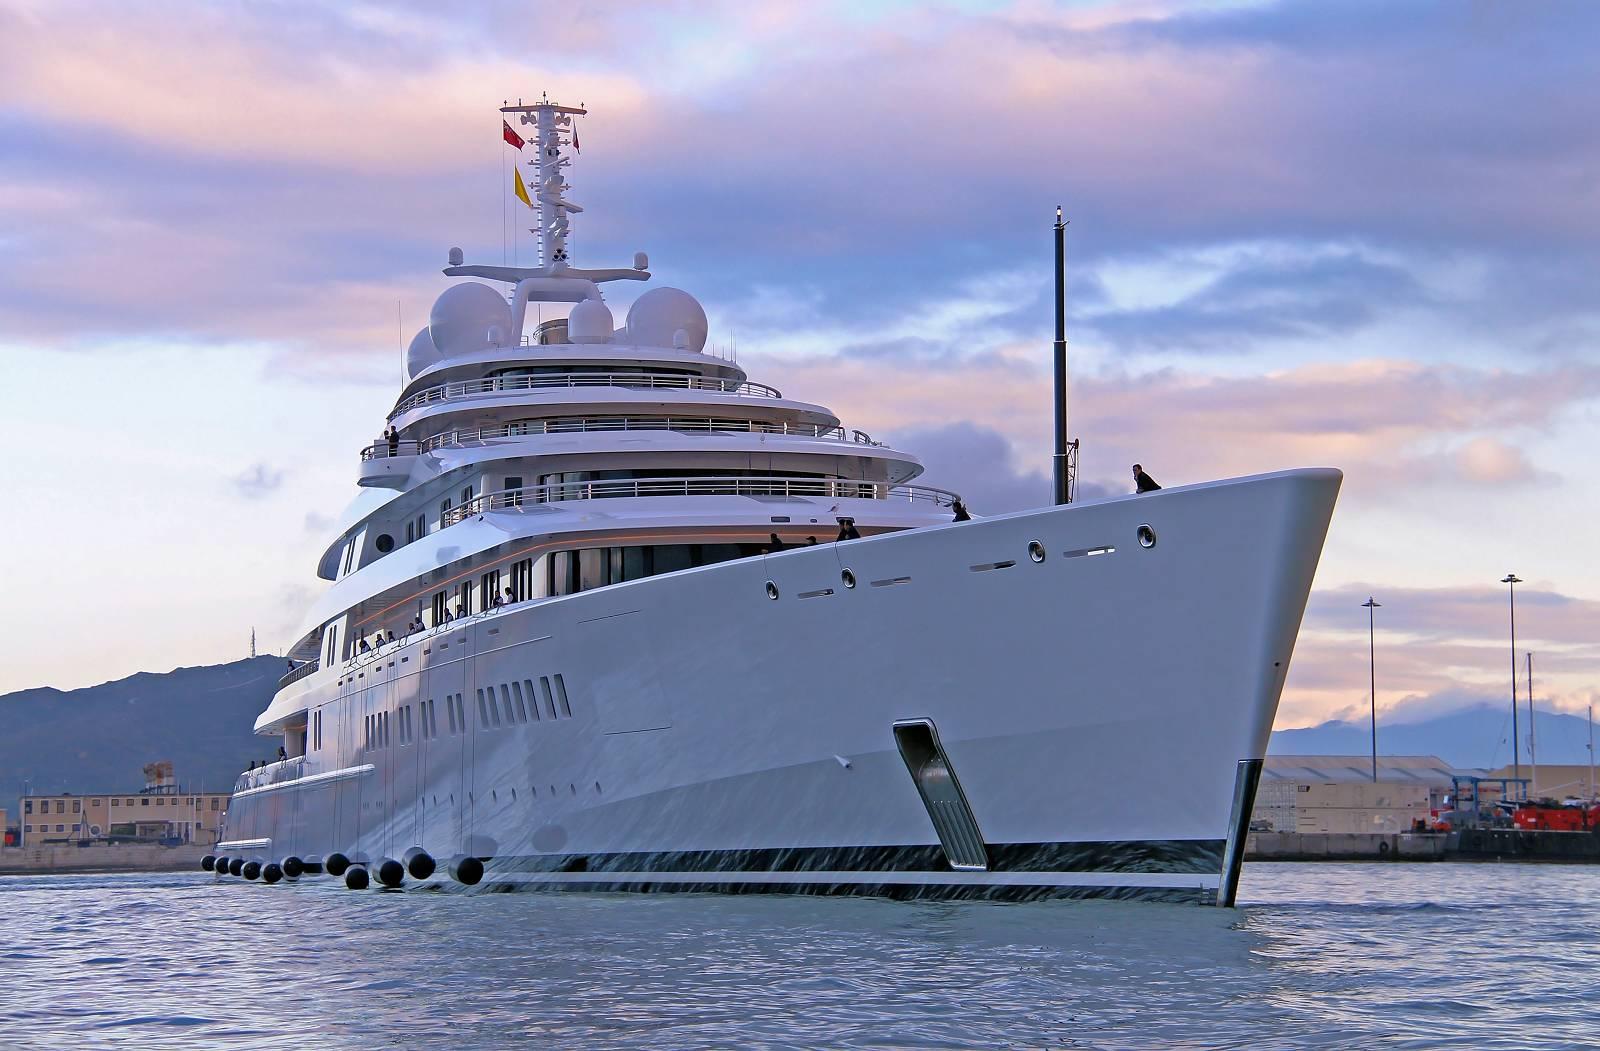 Luxury Superyacht AZZAM Photo By Giovanni Romero